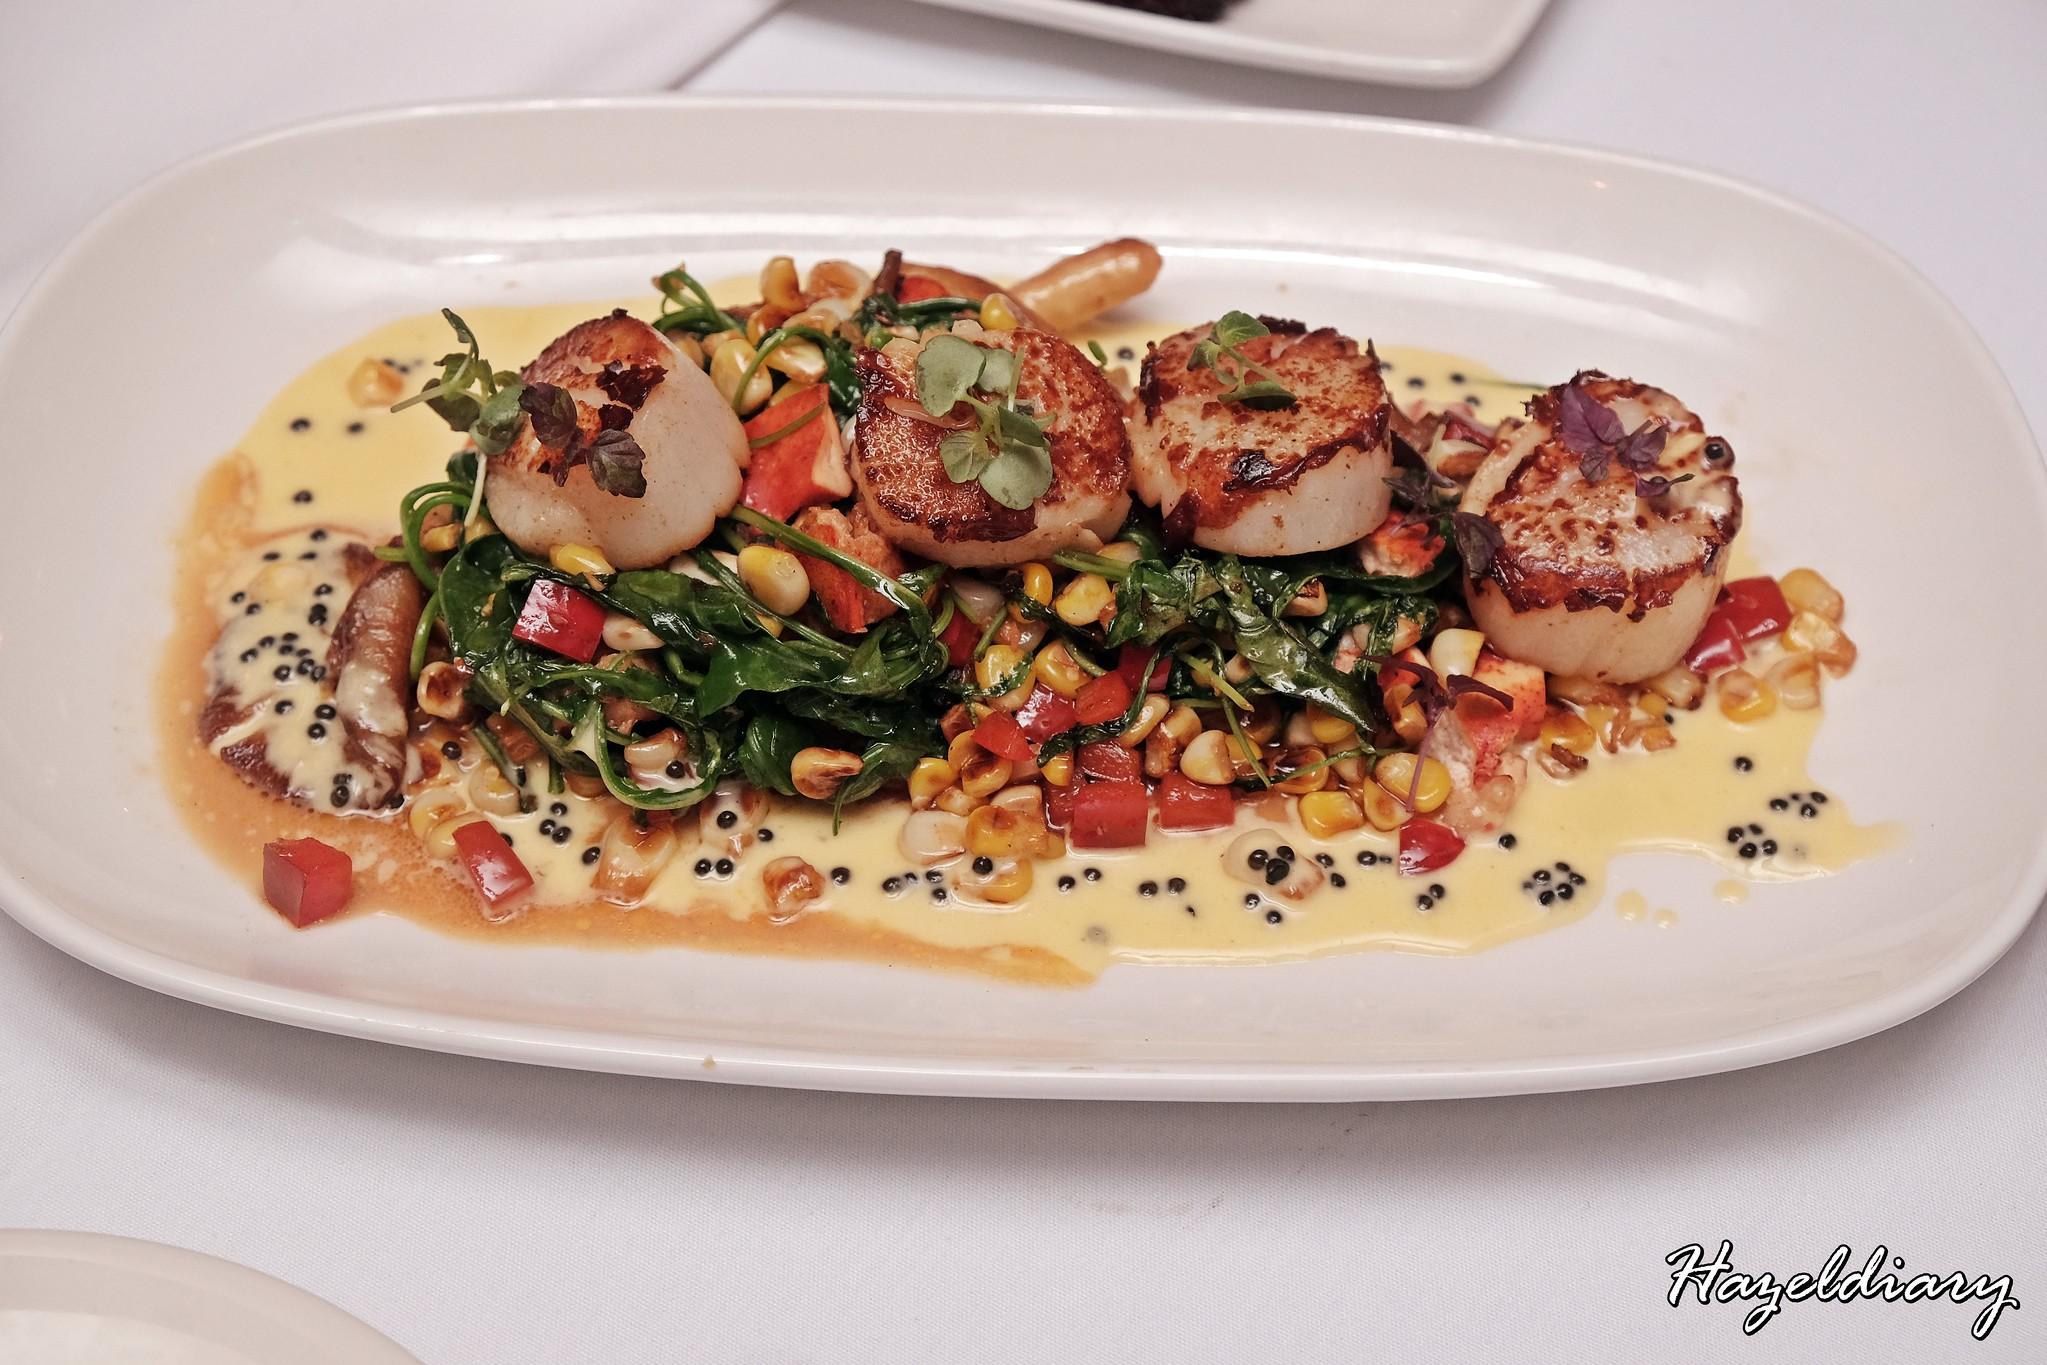 Morton's Steakhouse Mandarin Oriental-Seared Sea Scallops with Lobster & Caviar Butter